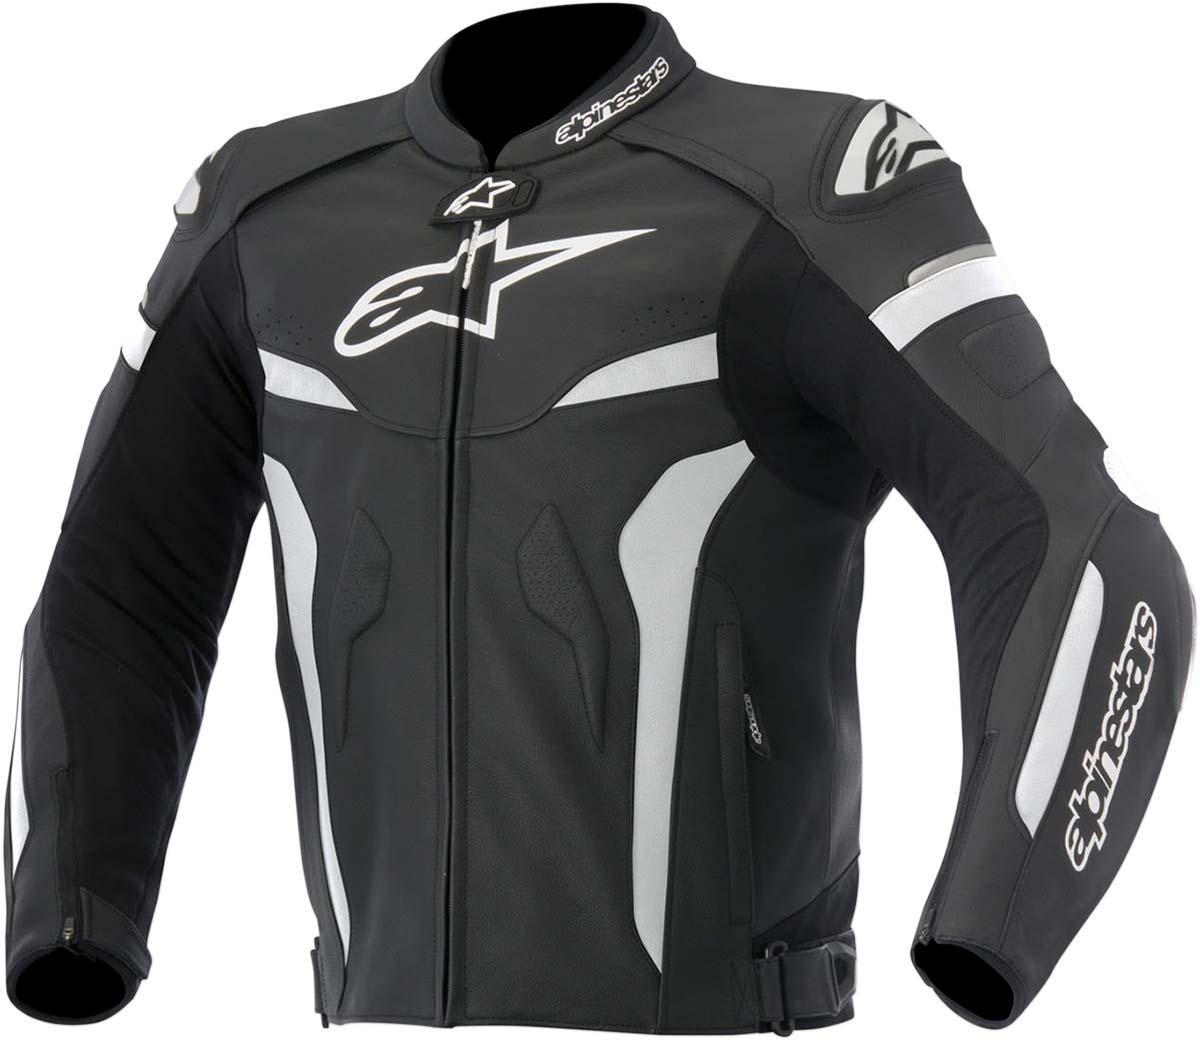 Alpinestars CELER Leather Jacket w/ Speed Hump (Black/White)